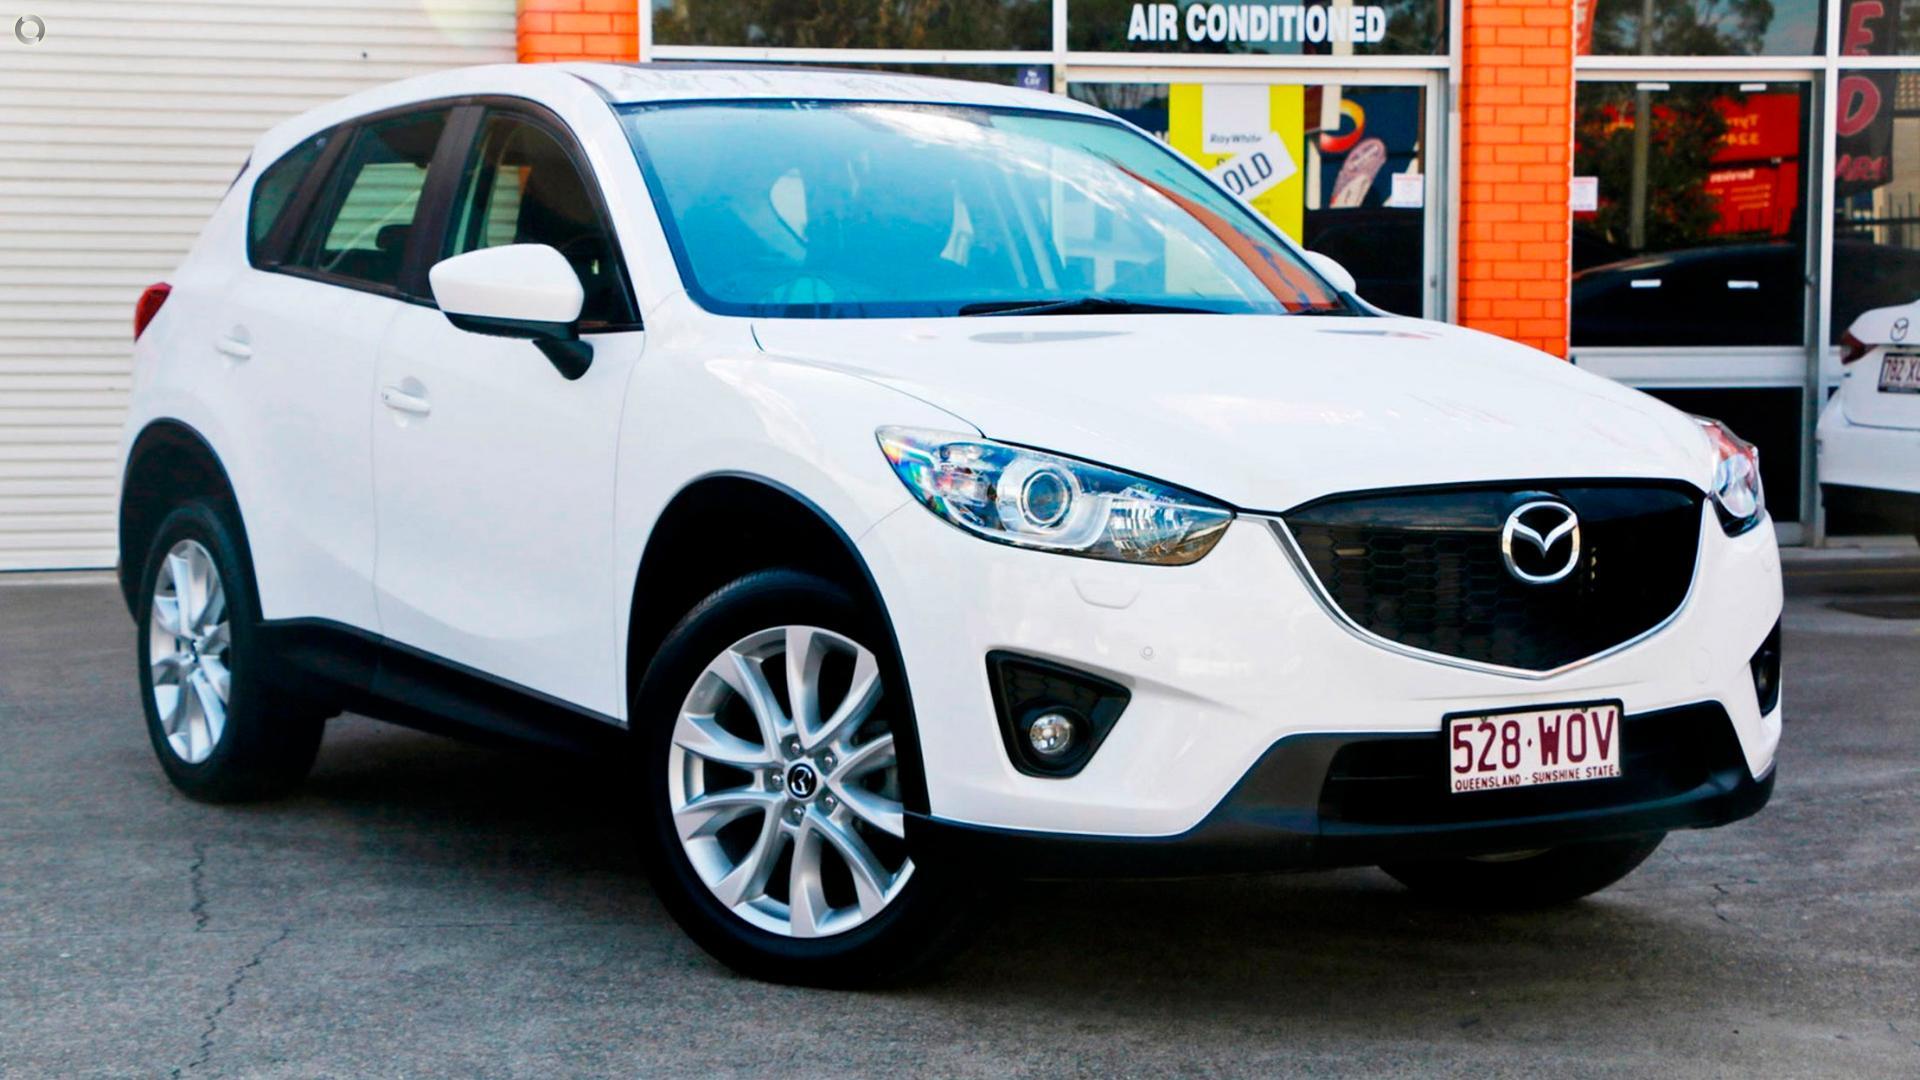 2012 Mazda Cx-5 KE Series